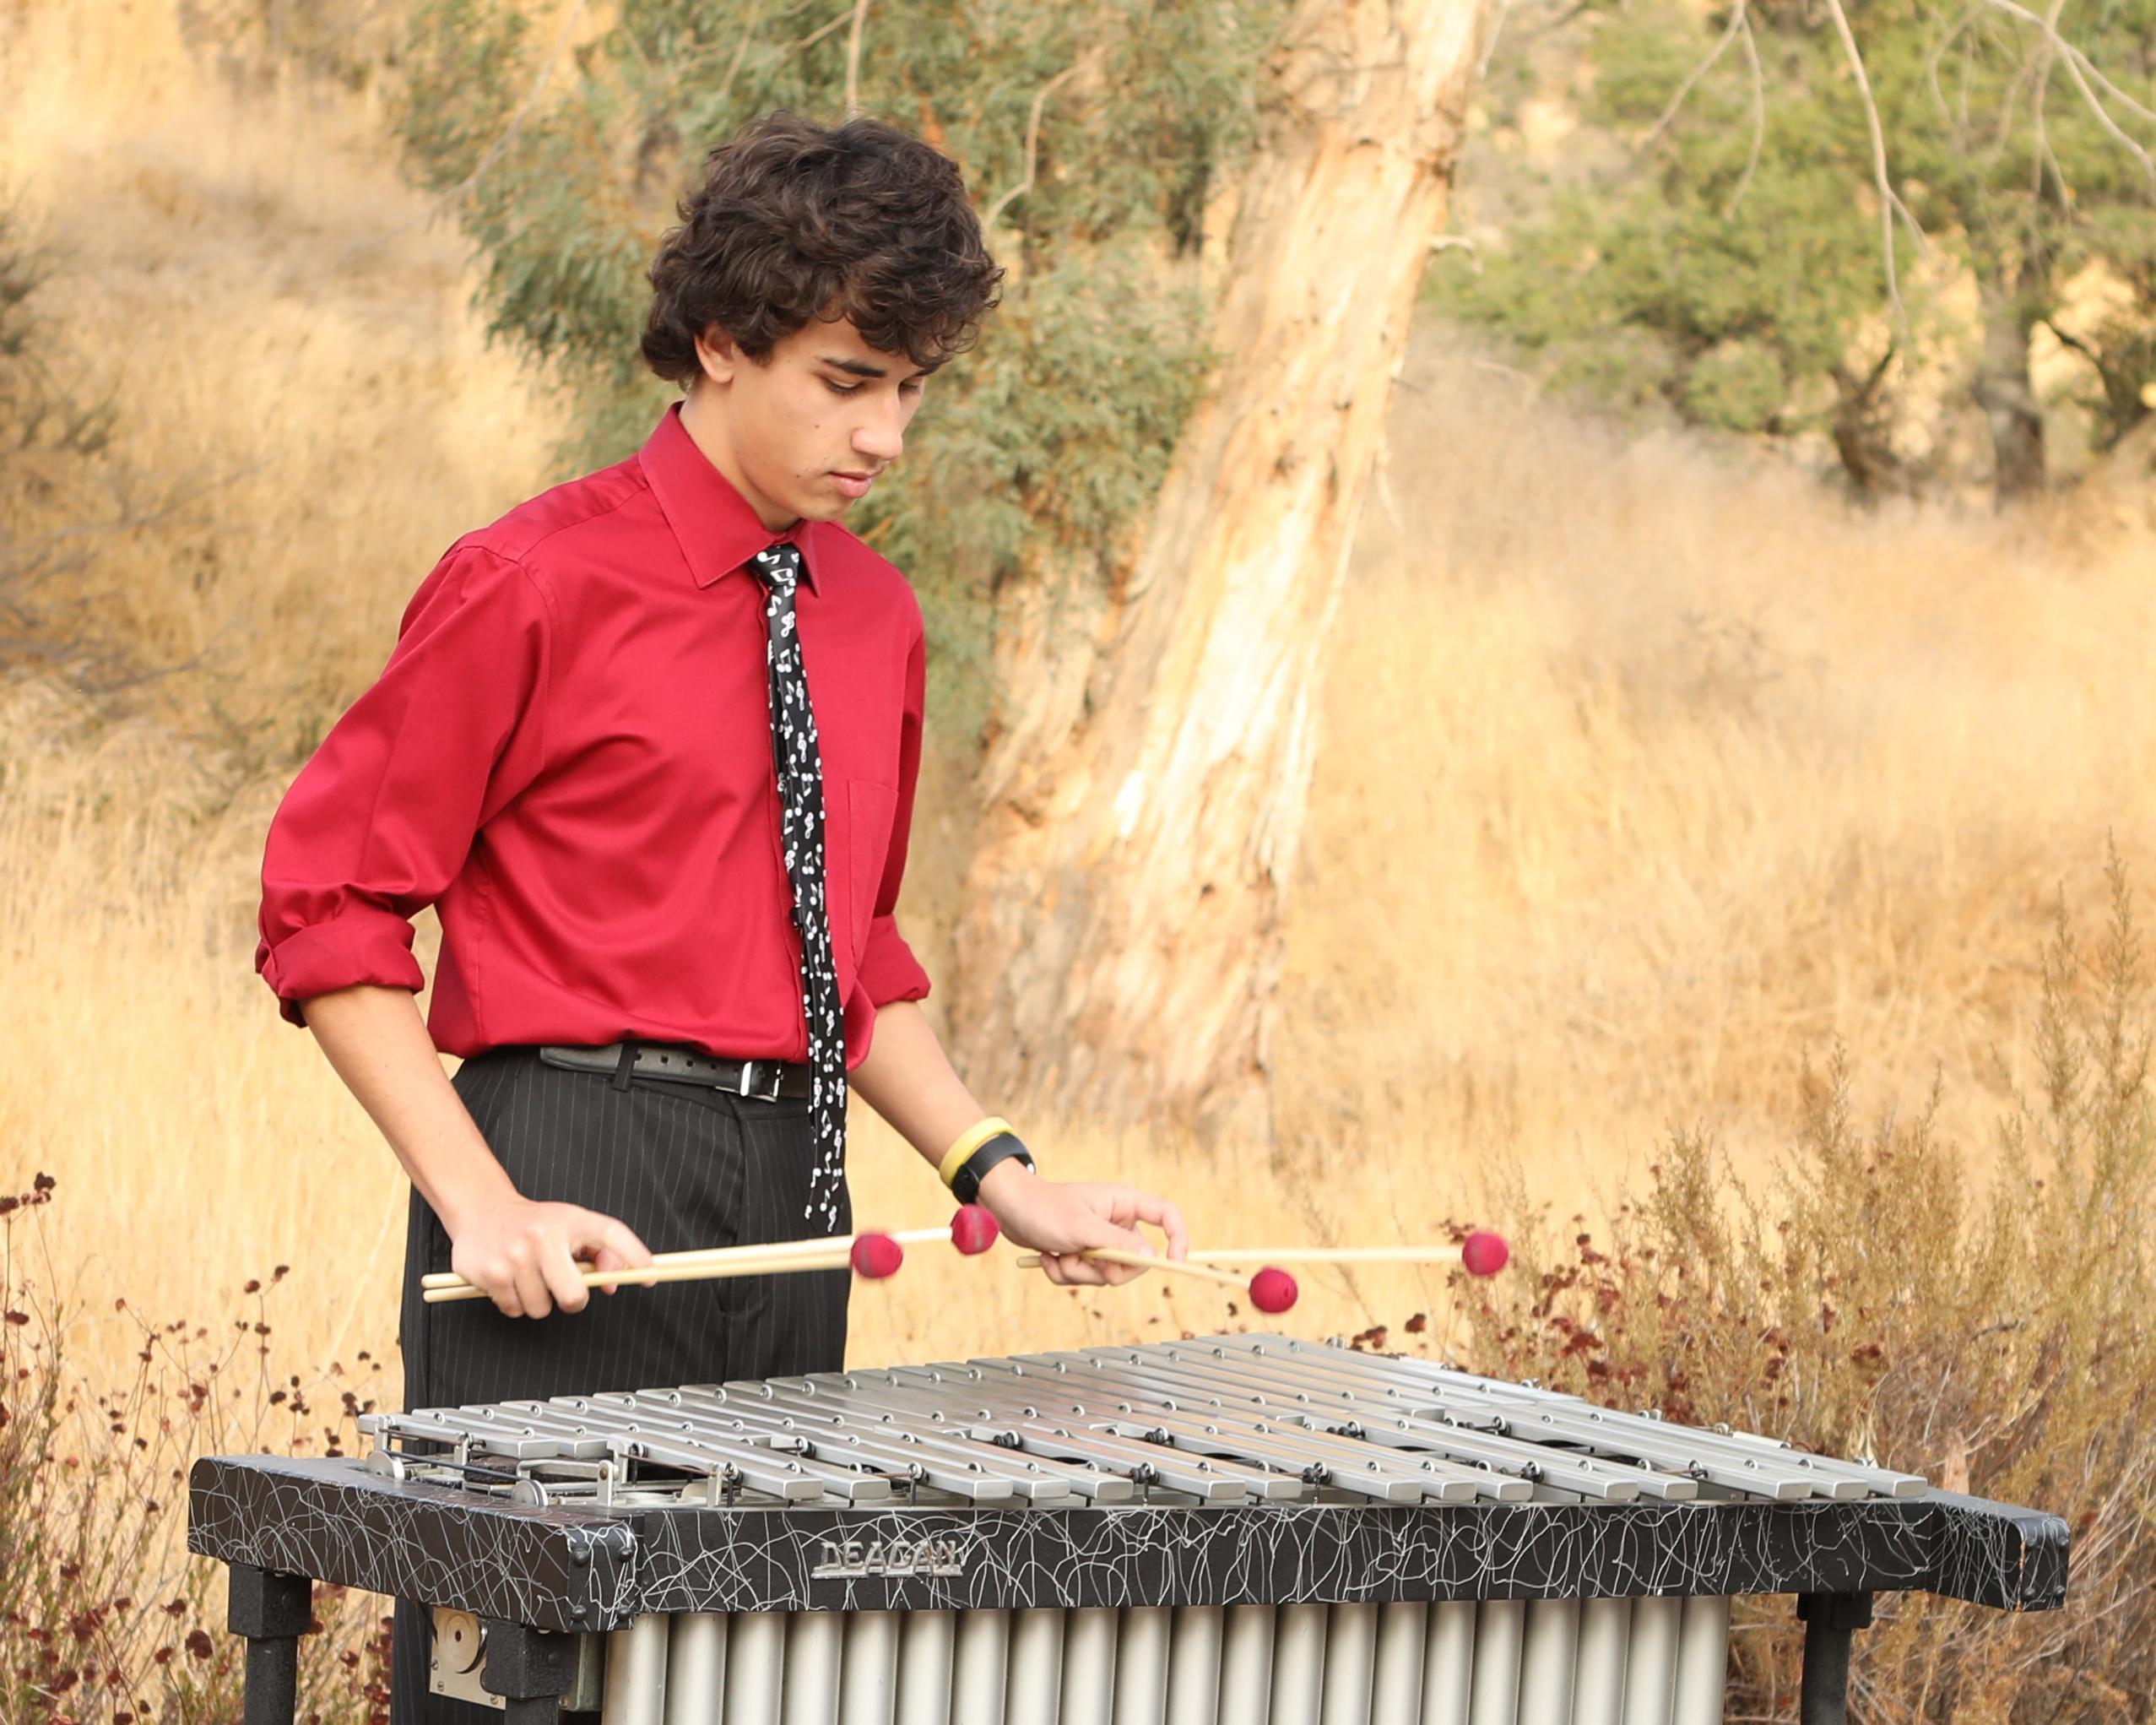 Robby Good playing vibraphone